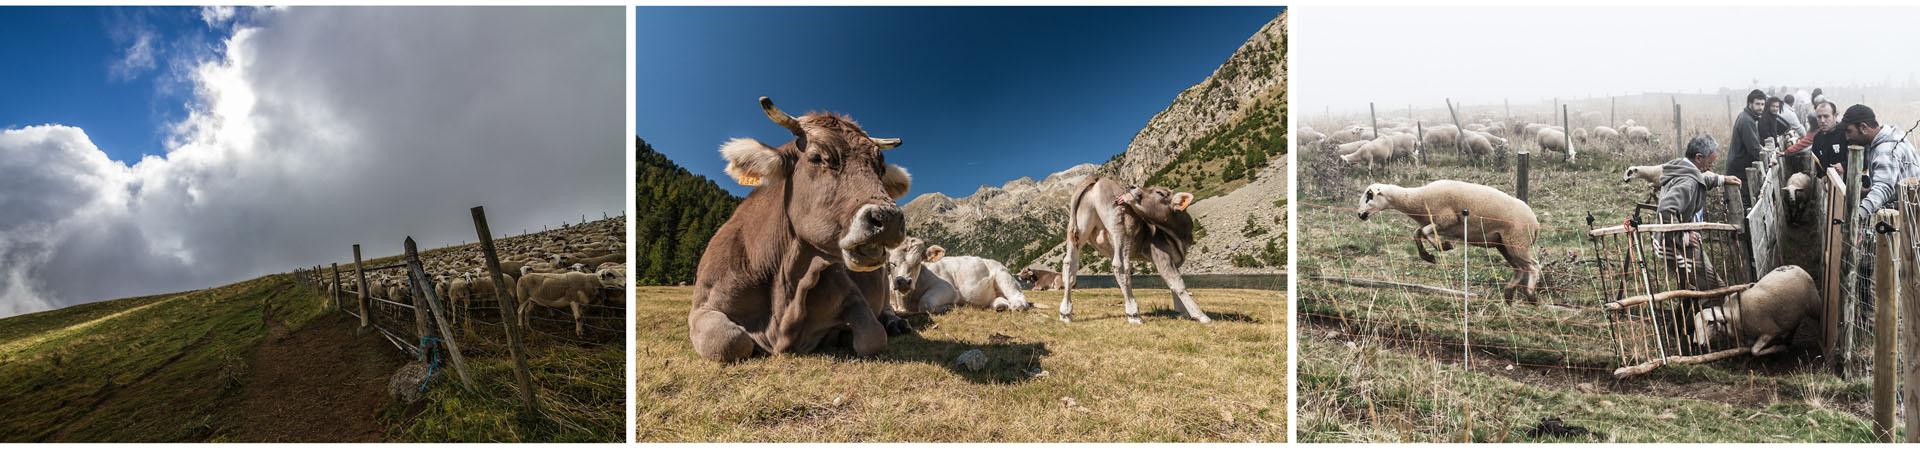 Recull, pastura, triatge. Foto: Sergi Balaguer